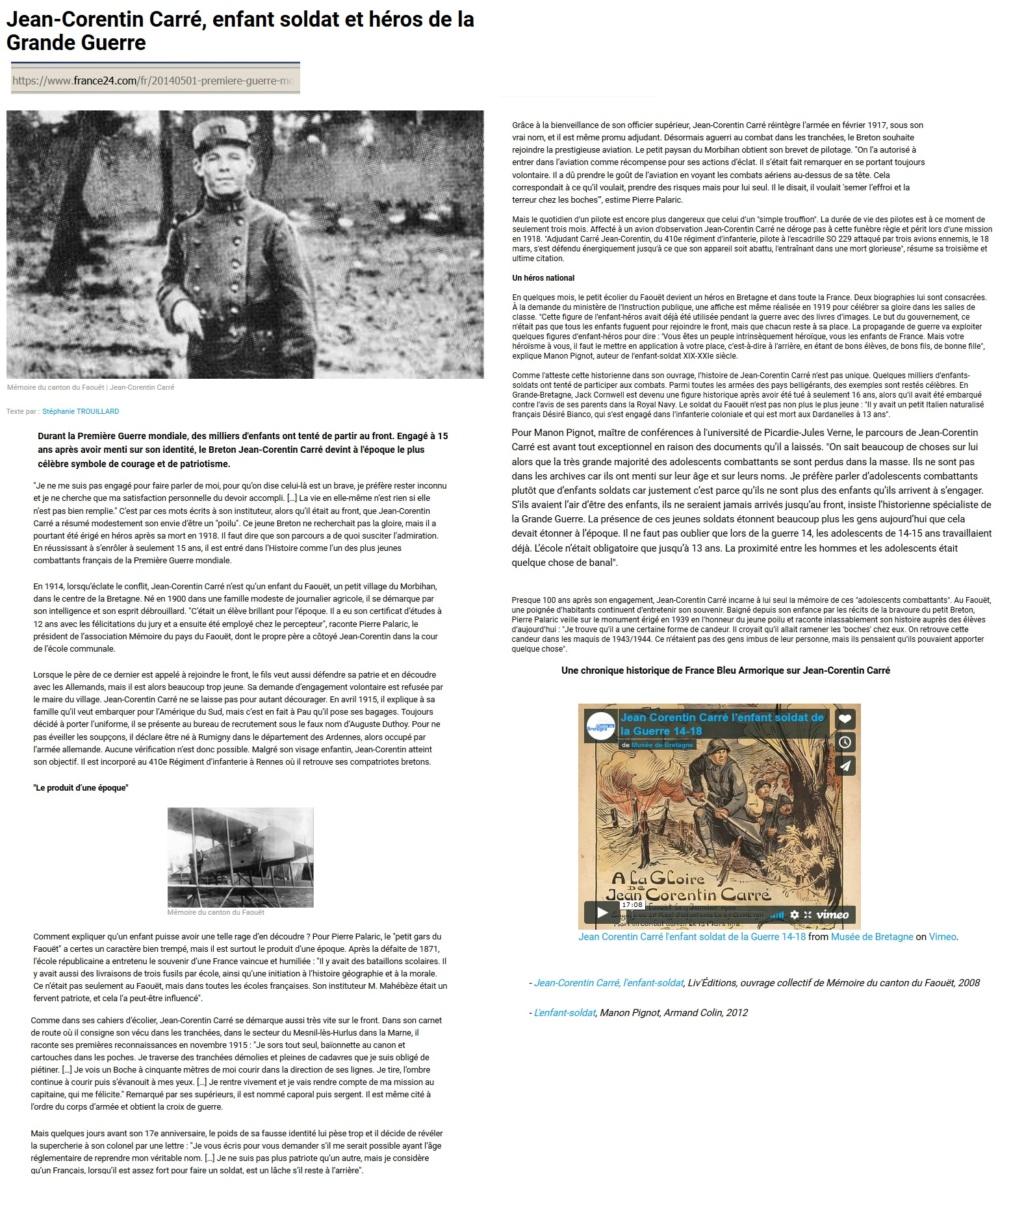 Les enfants-soldats de la Grande guerre. Corent10